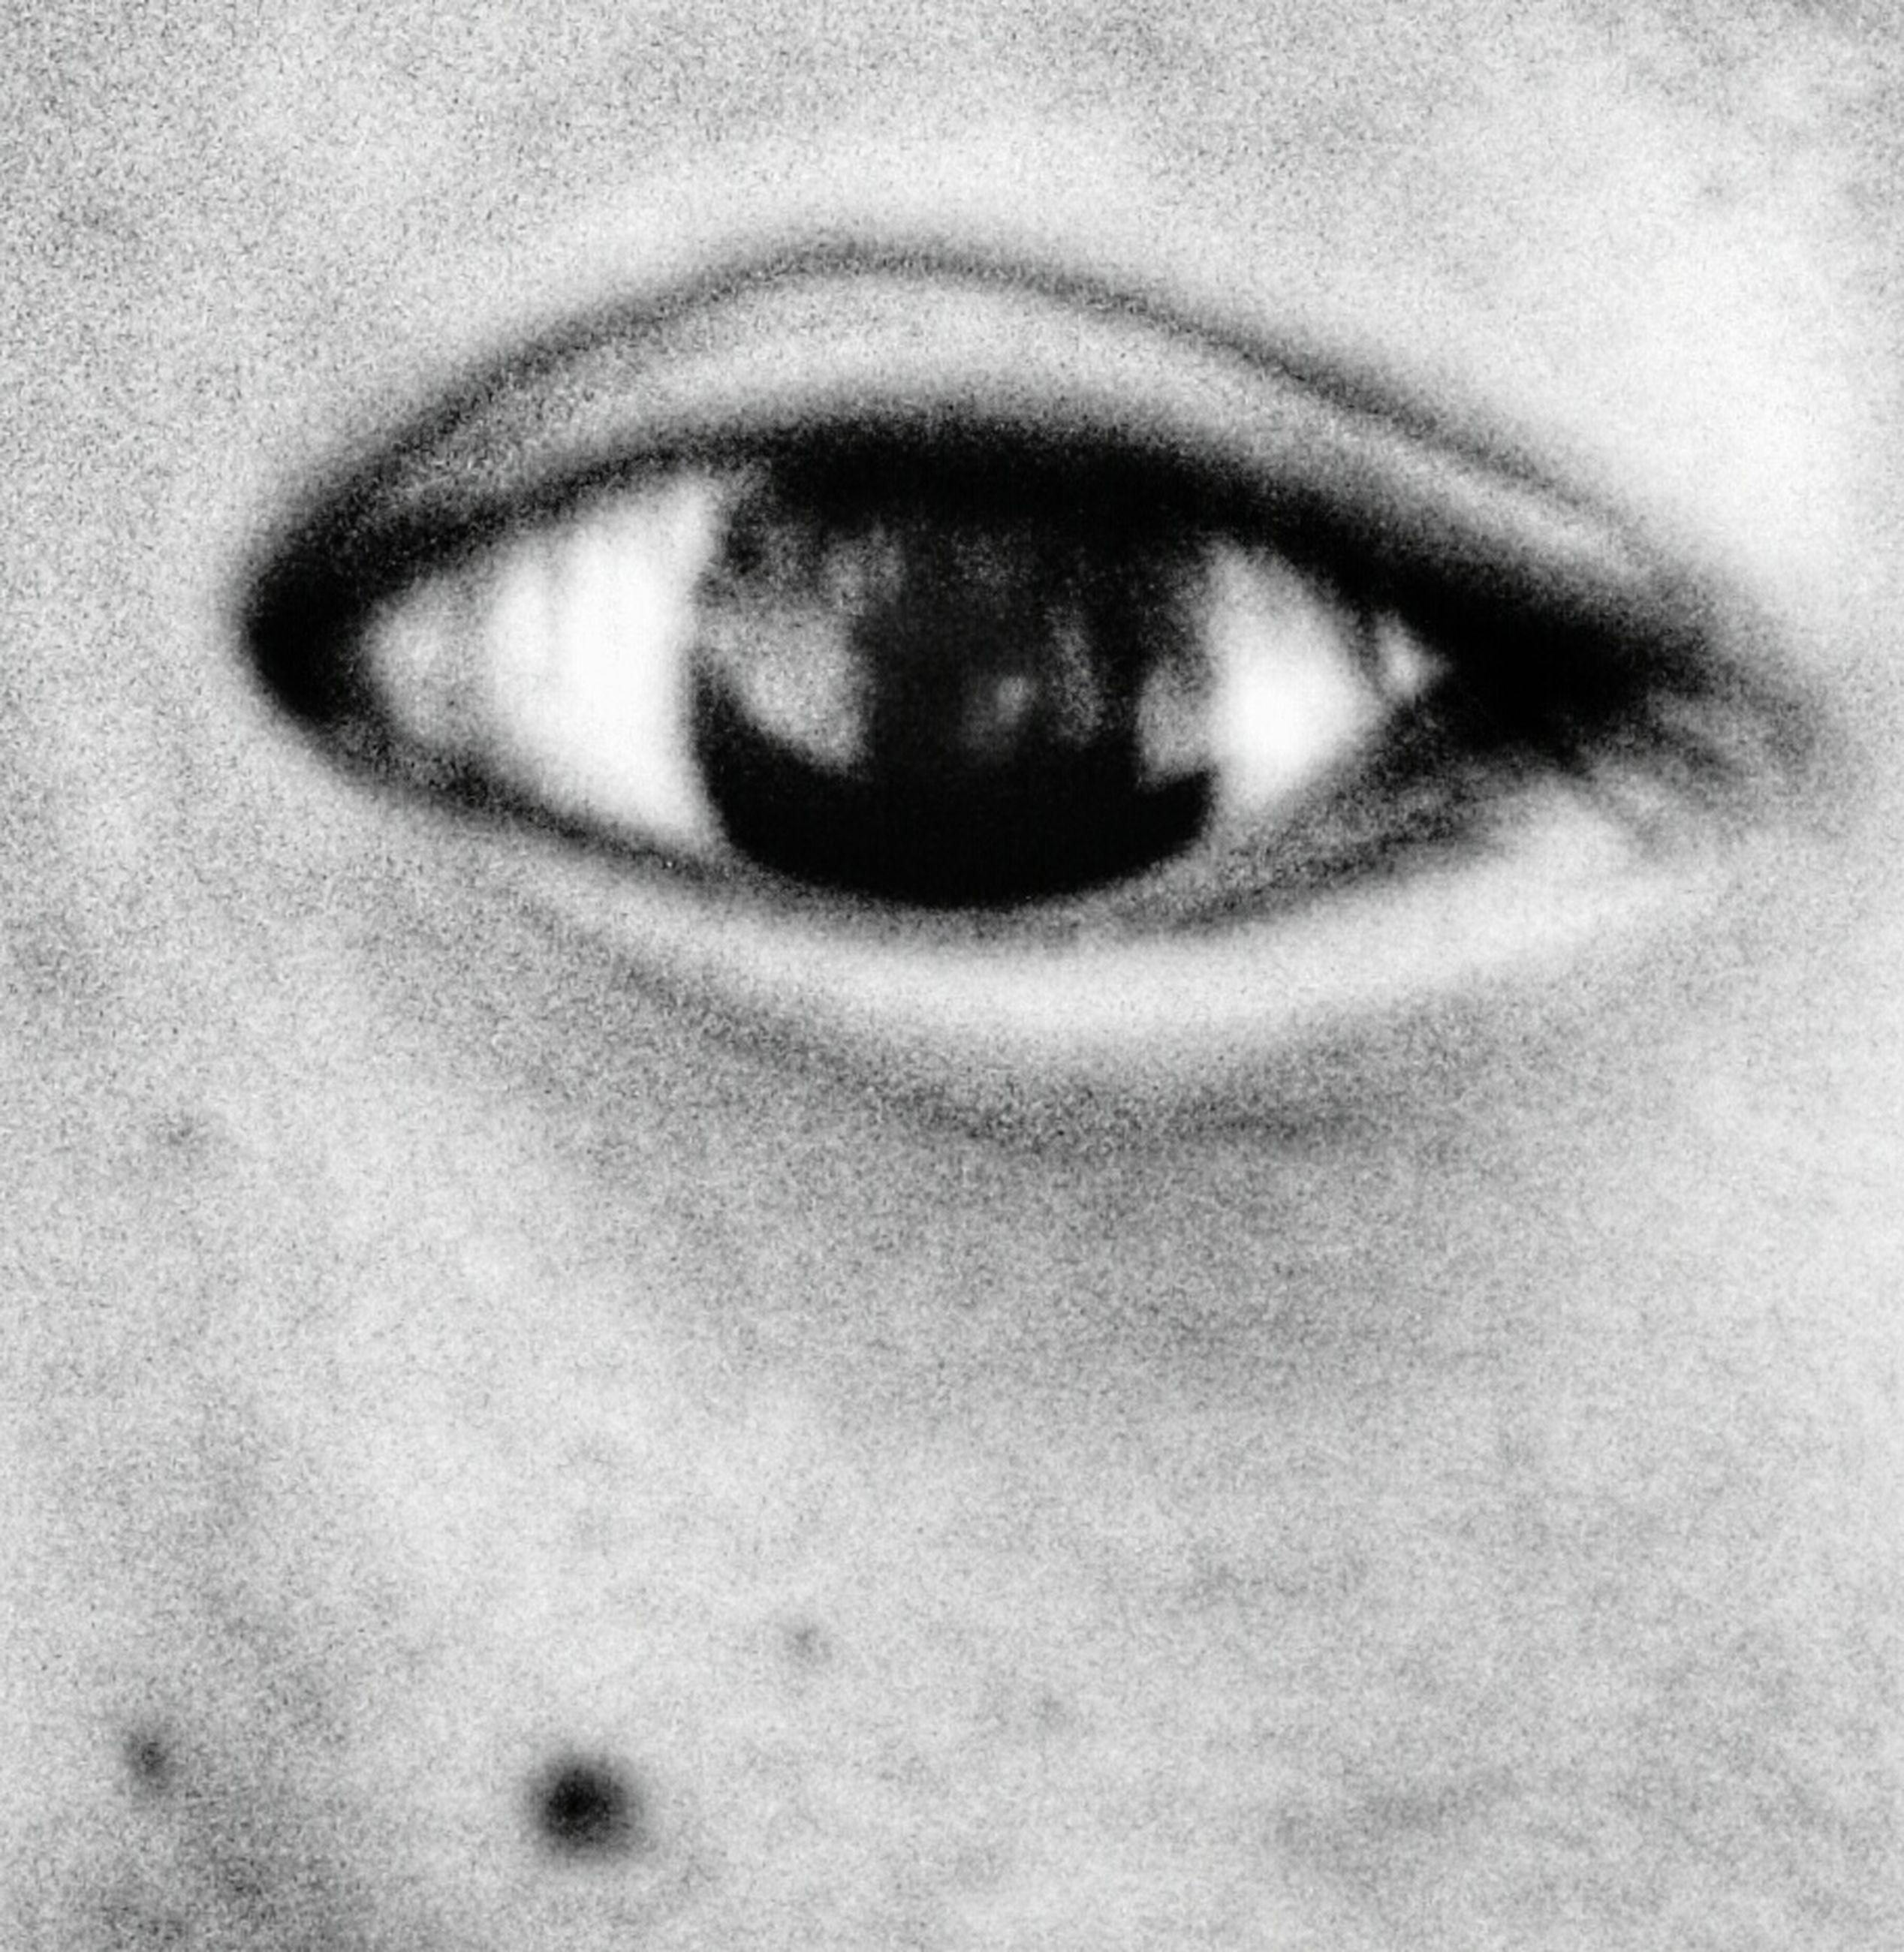 human eye, close-up, indoors, eyesight, eyelash, human skin, part of, sensory perception, extreme close-up, looking at camera, portrait, human face, unrecognizable person, studio shot, extreme close up, selective focus, lifestyles